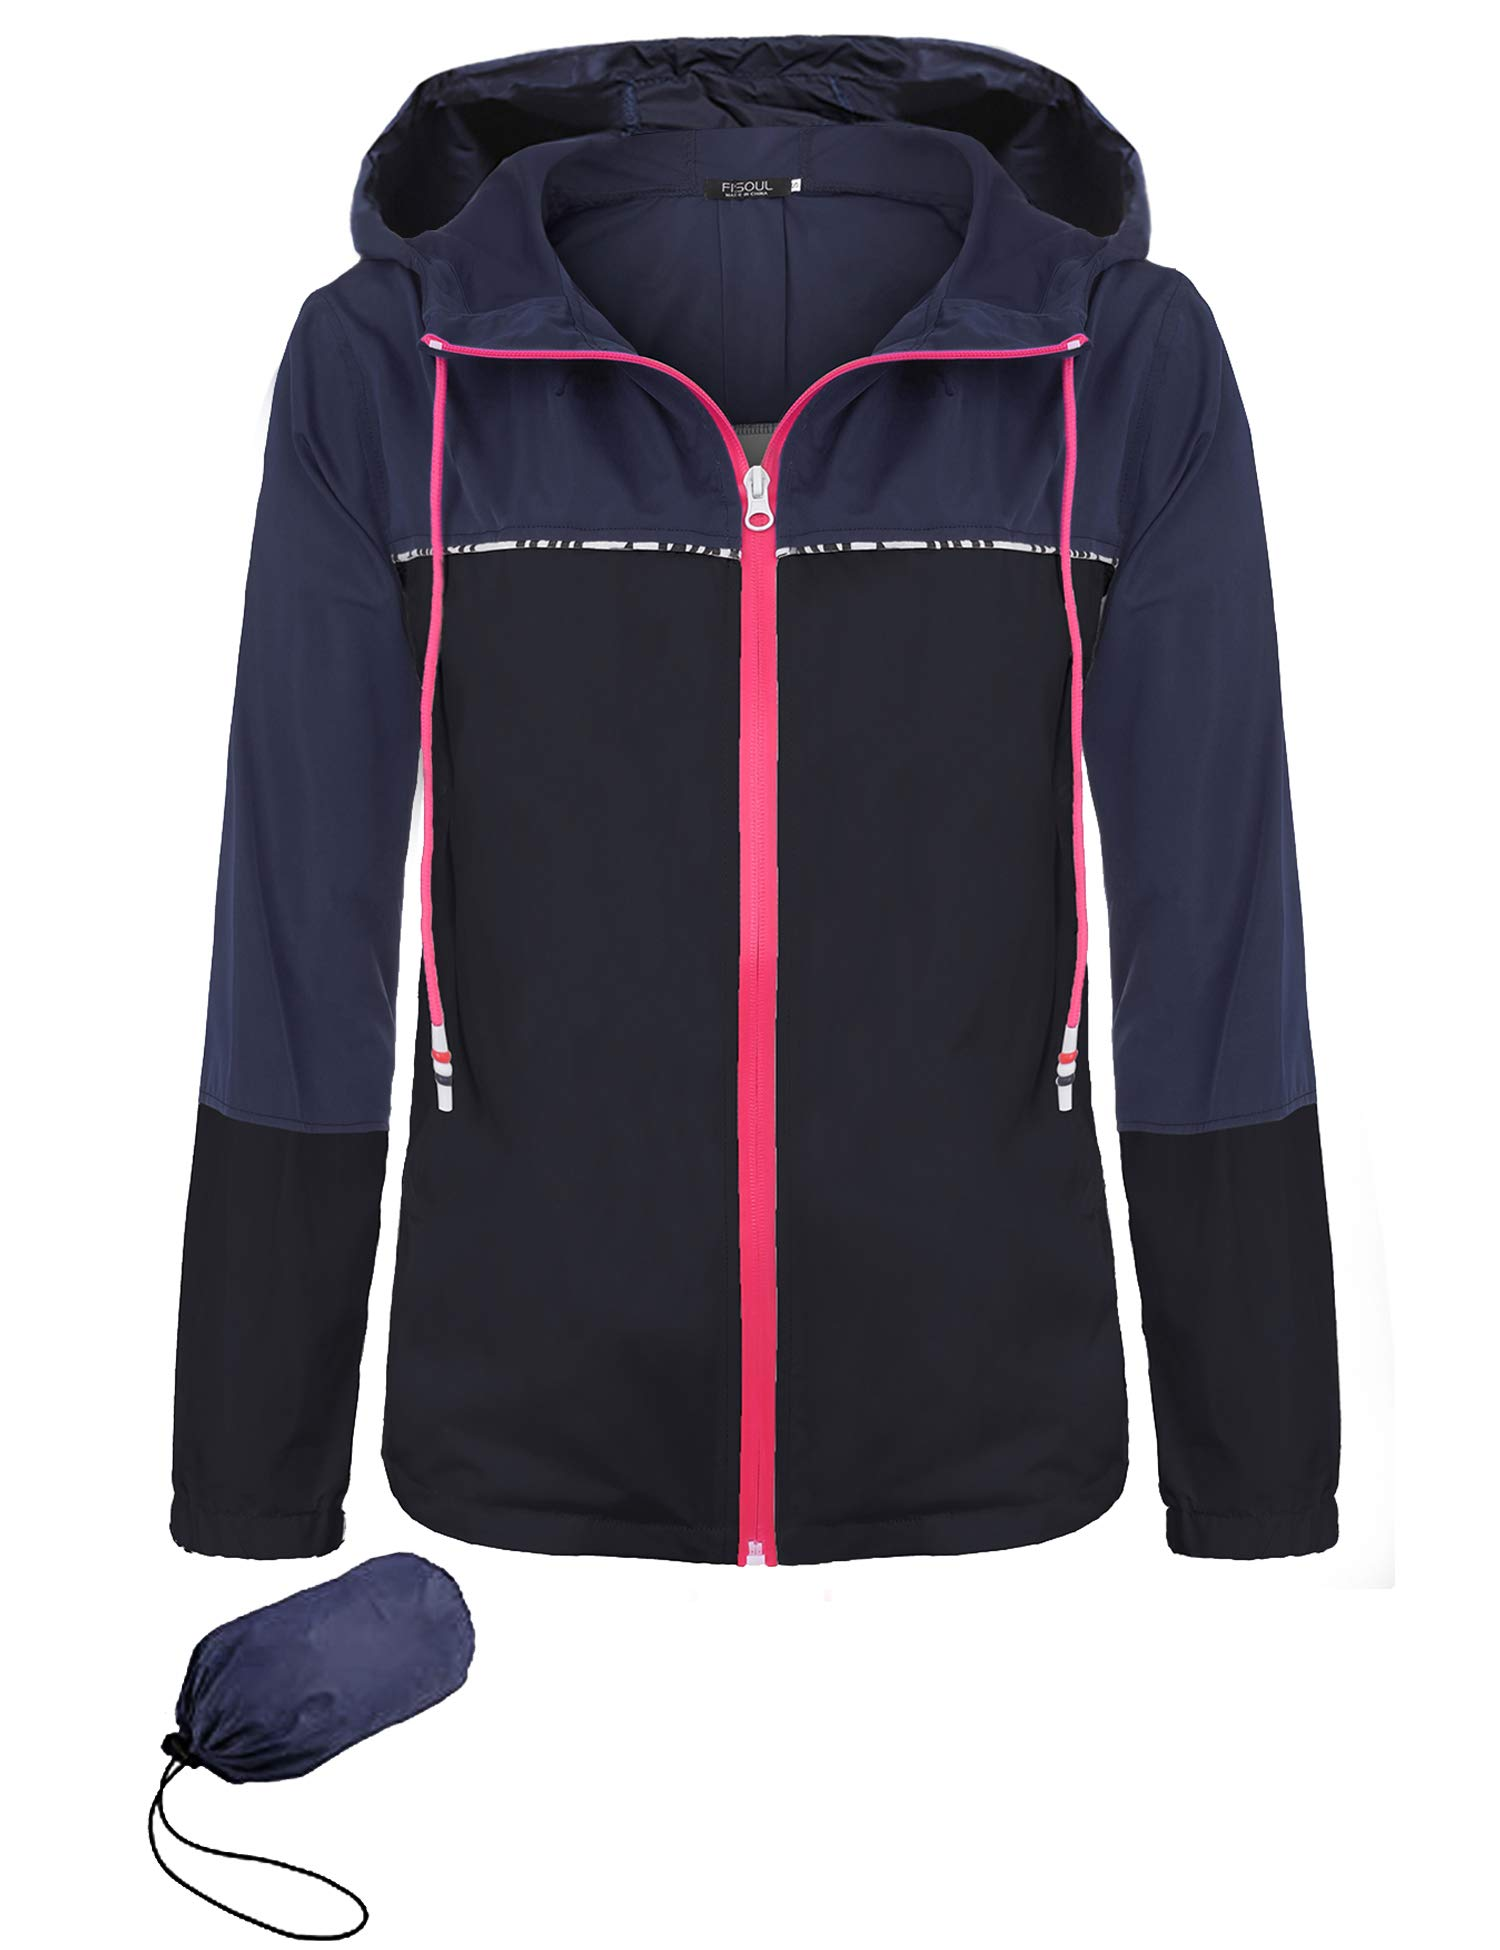 FISOUL Women's Waterproof Raincoat Active Outdoor Hooded Rain Jacket Lightweight Windbreaker S-XXL(Gray/Black,Large)